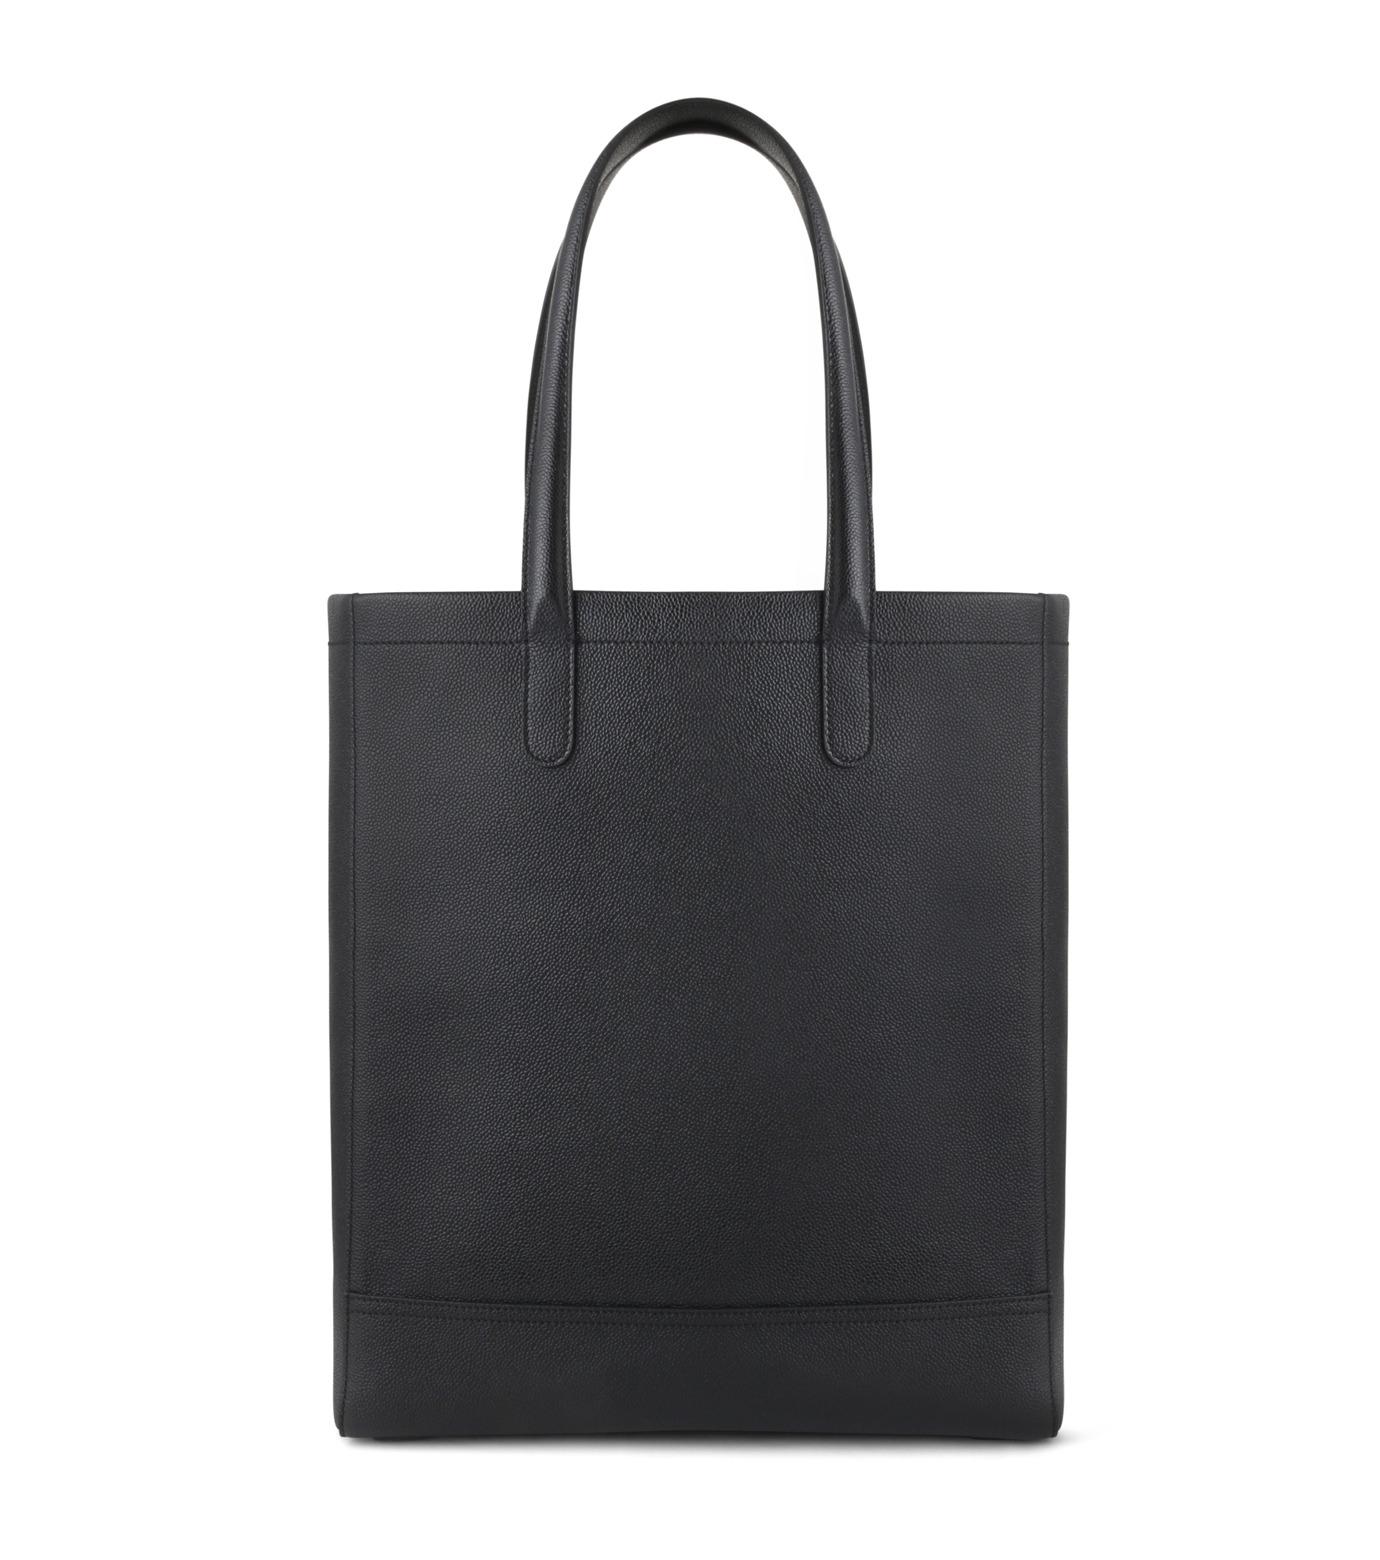 Thom Browne(トムブラウン)のLeather Tote-BLACK(ハンドバッグ/hand bag)-MAG059A00198-13 拡大詳細画像3